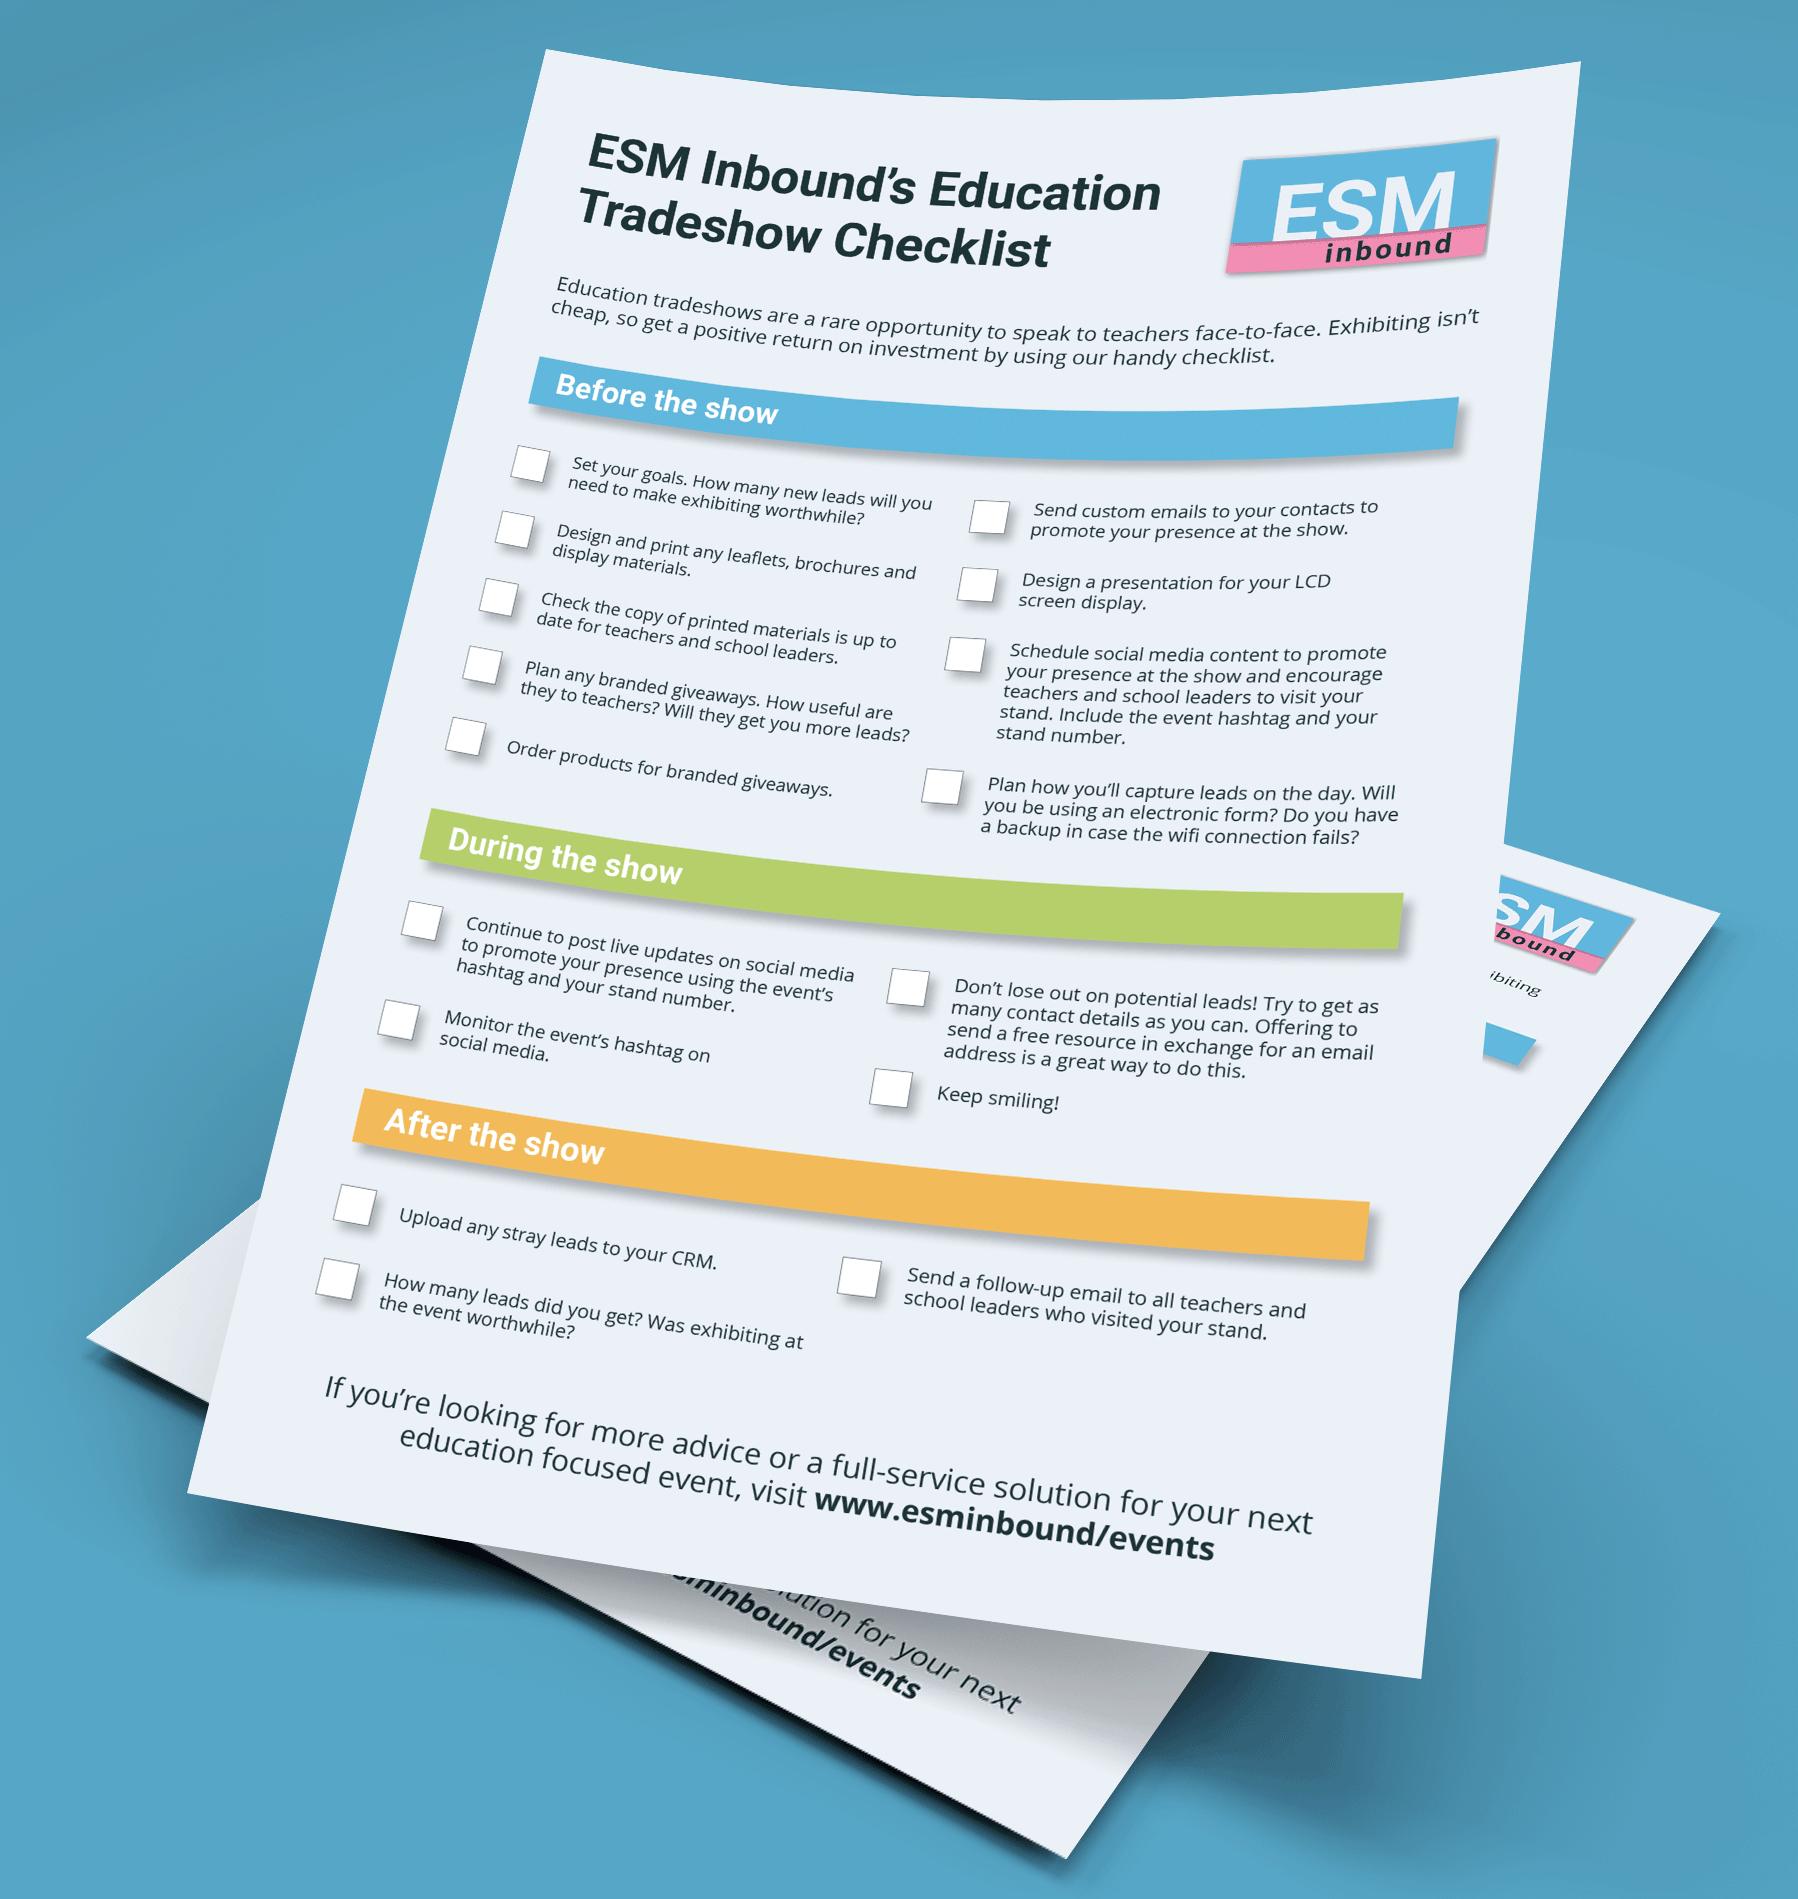 ESM Inbound's Education Tradeshow Checklist